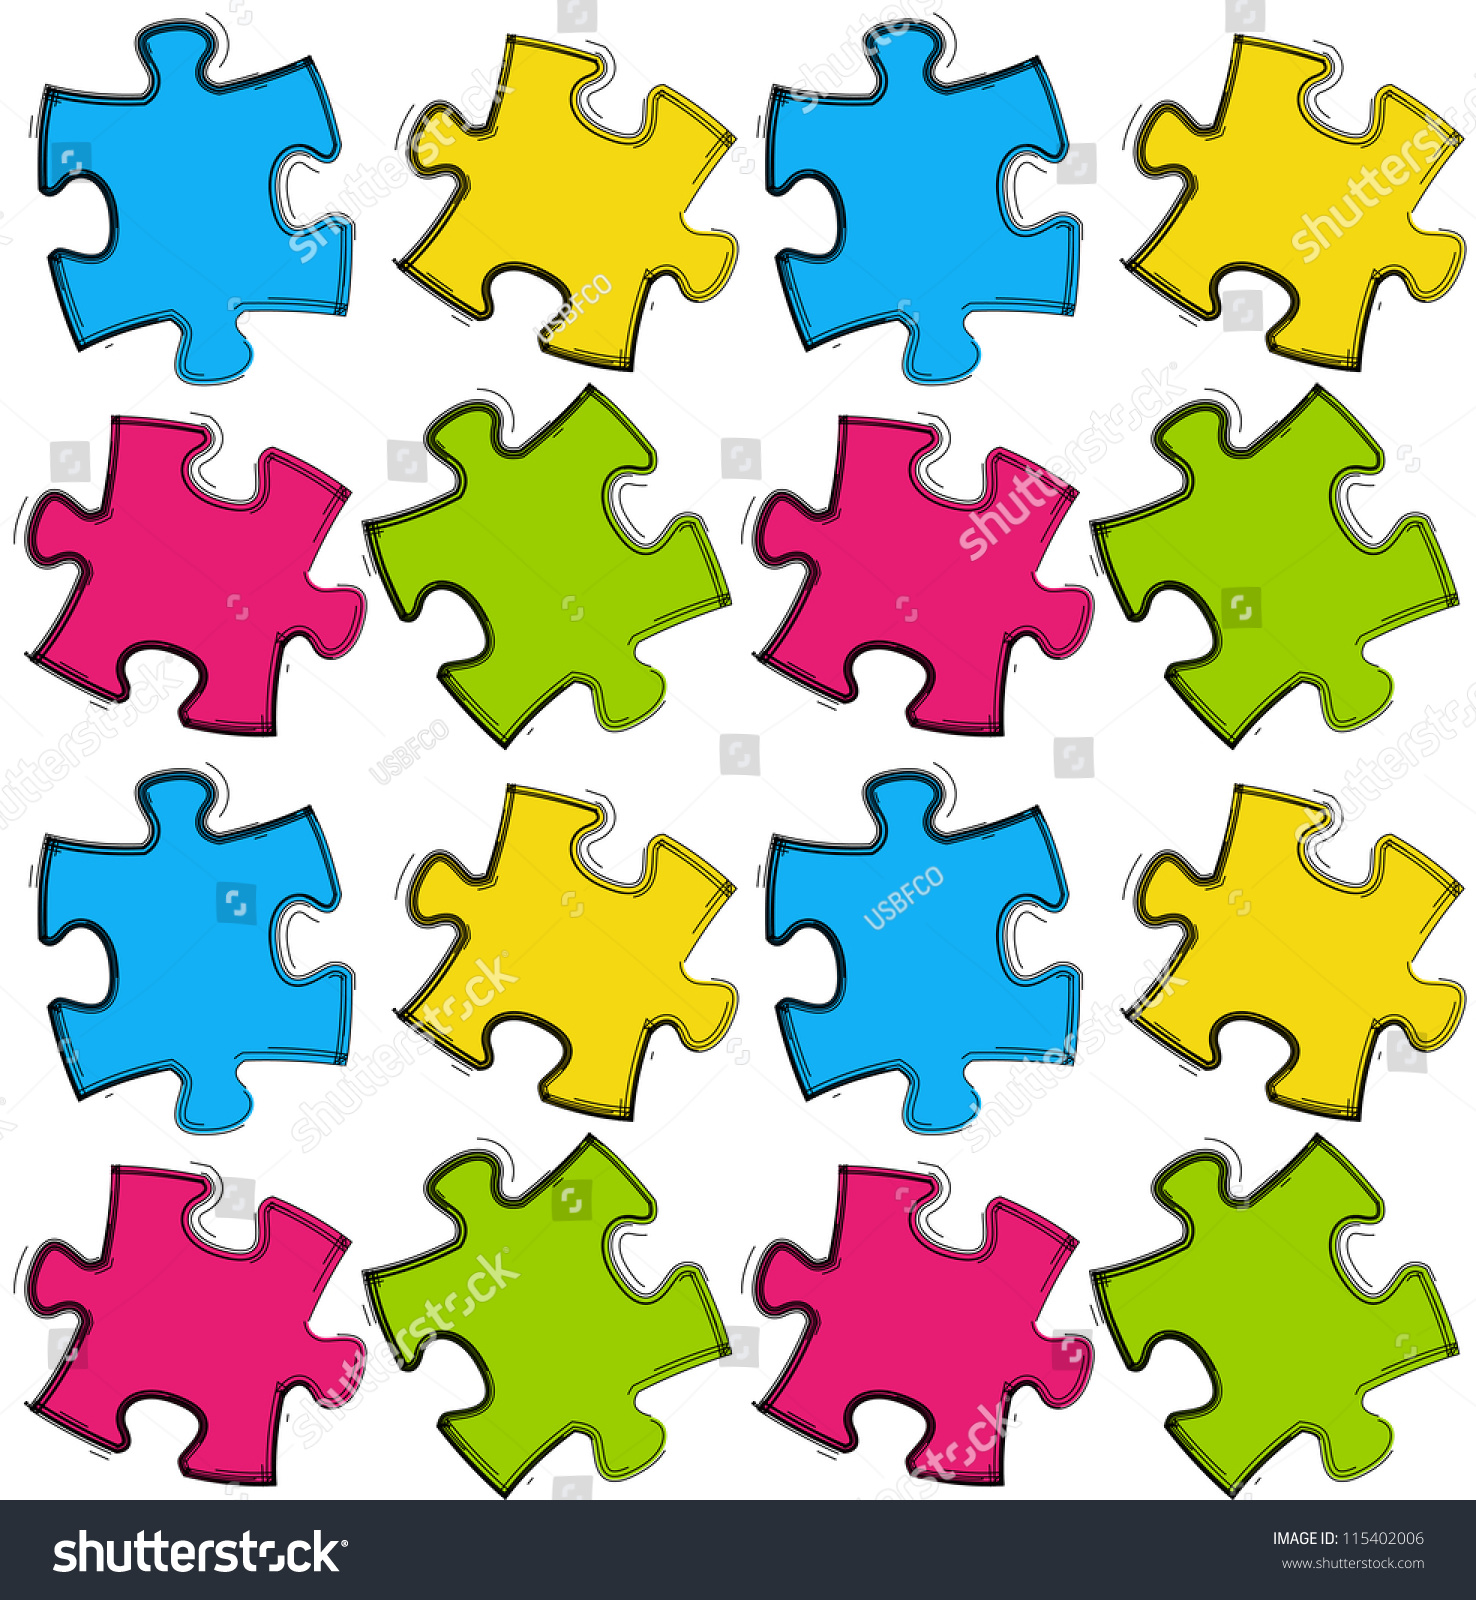 Puzzle Seamless Pattern Stock Vector Illustration ...